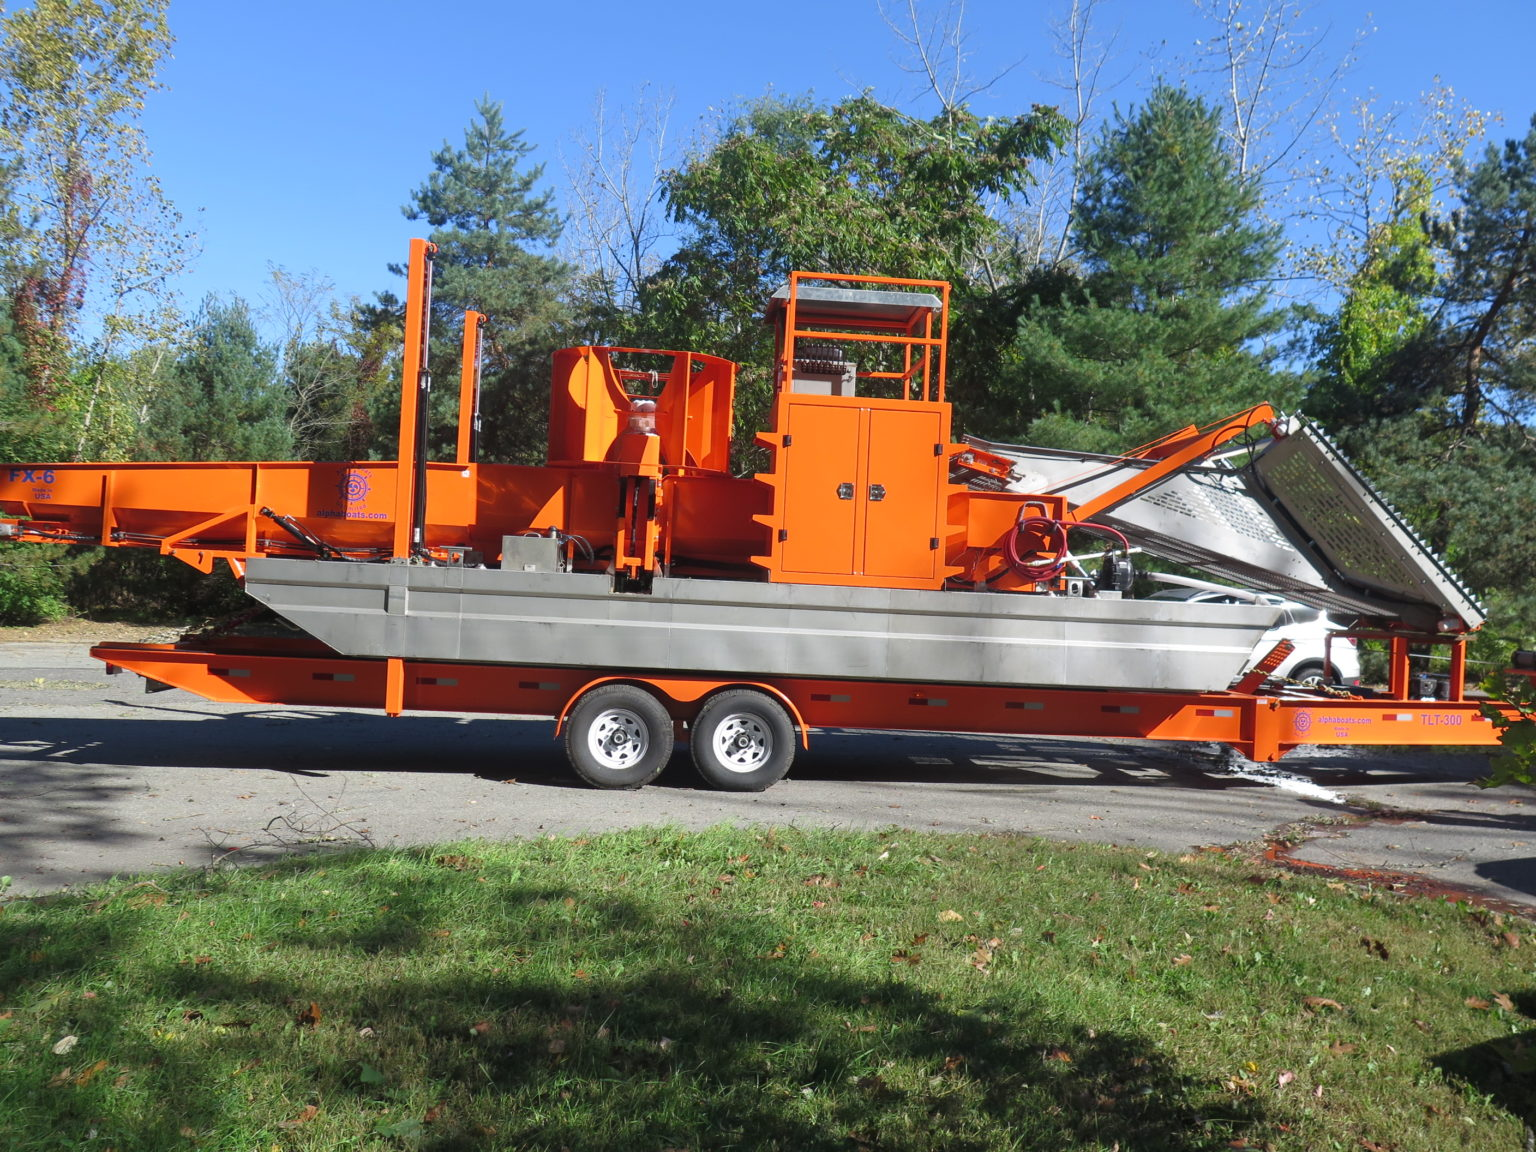 Alphaboats FX6 Waterweed Harvester on Alphaboats Transport Trailer